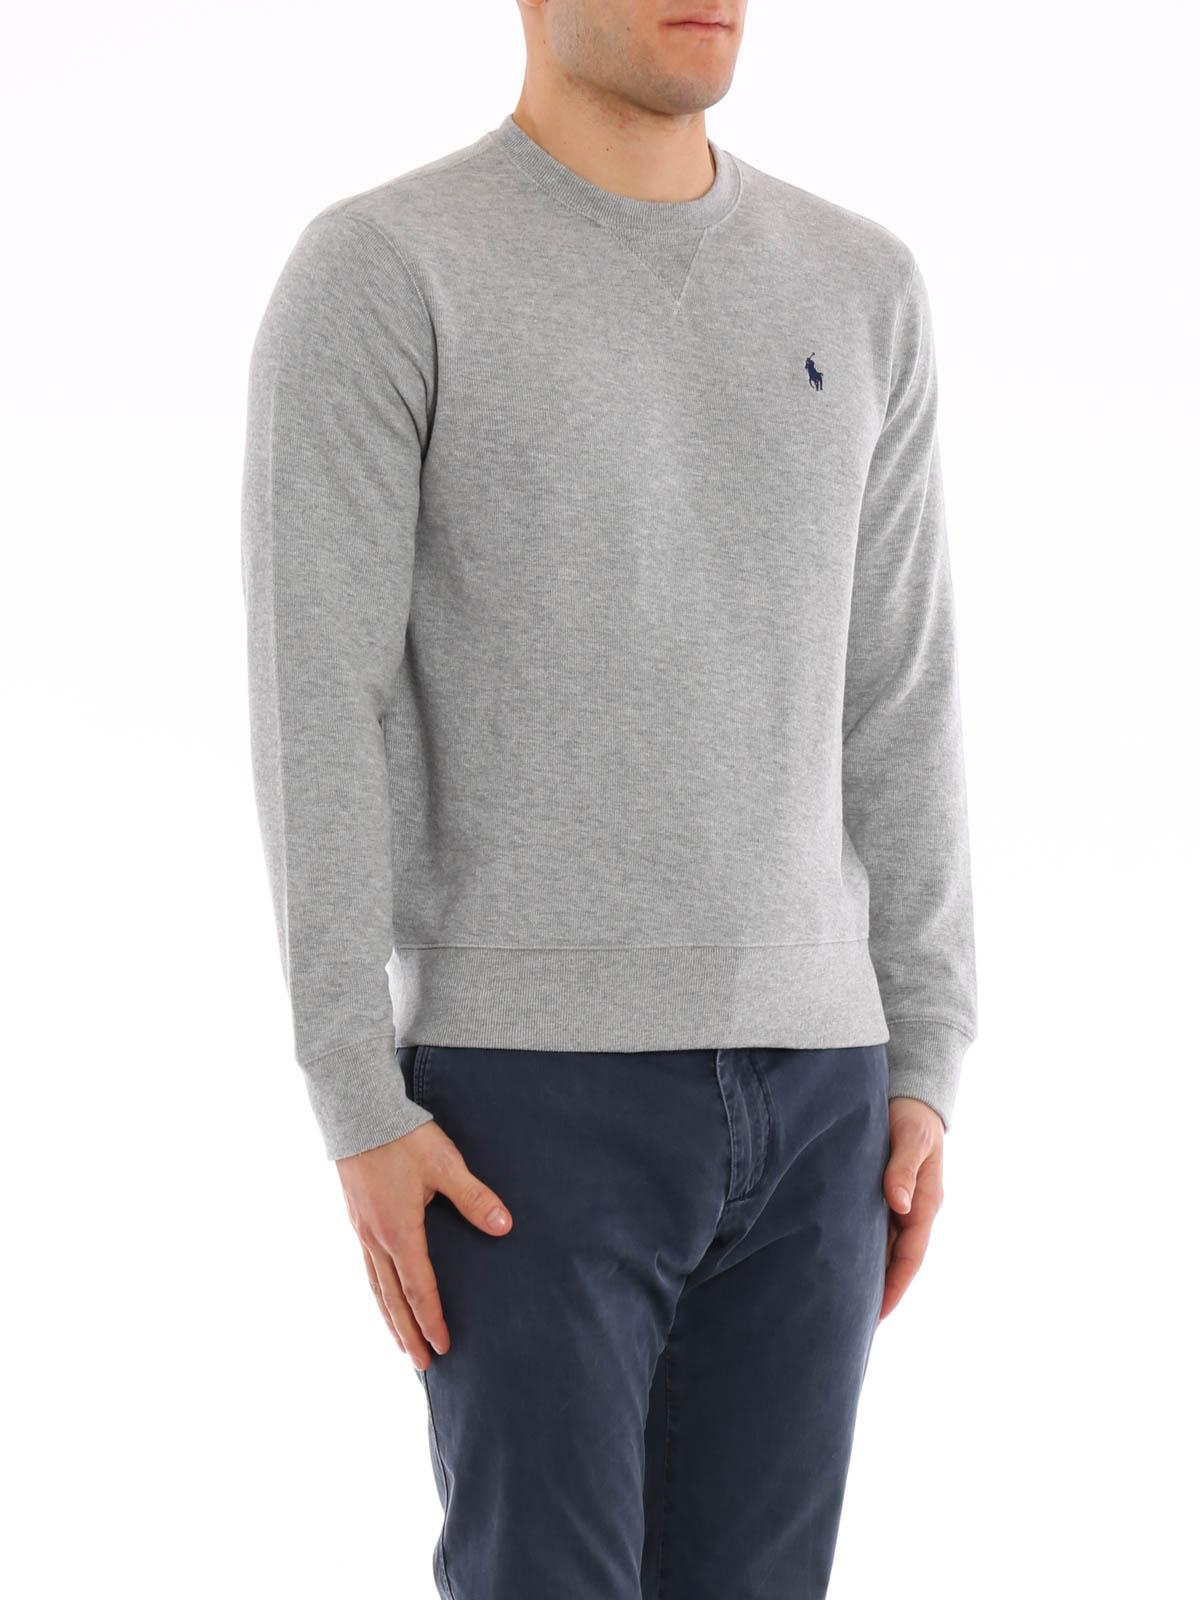 04a2c21eb iKRIX POLO RALPH LAUREN  Sweatshirts   Sweaters - Cotton crew neck  sweatshirt